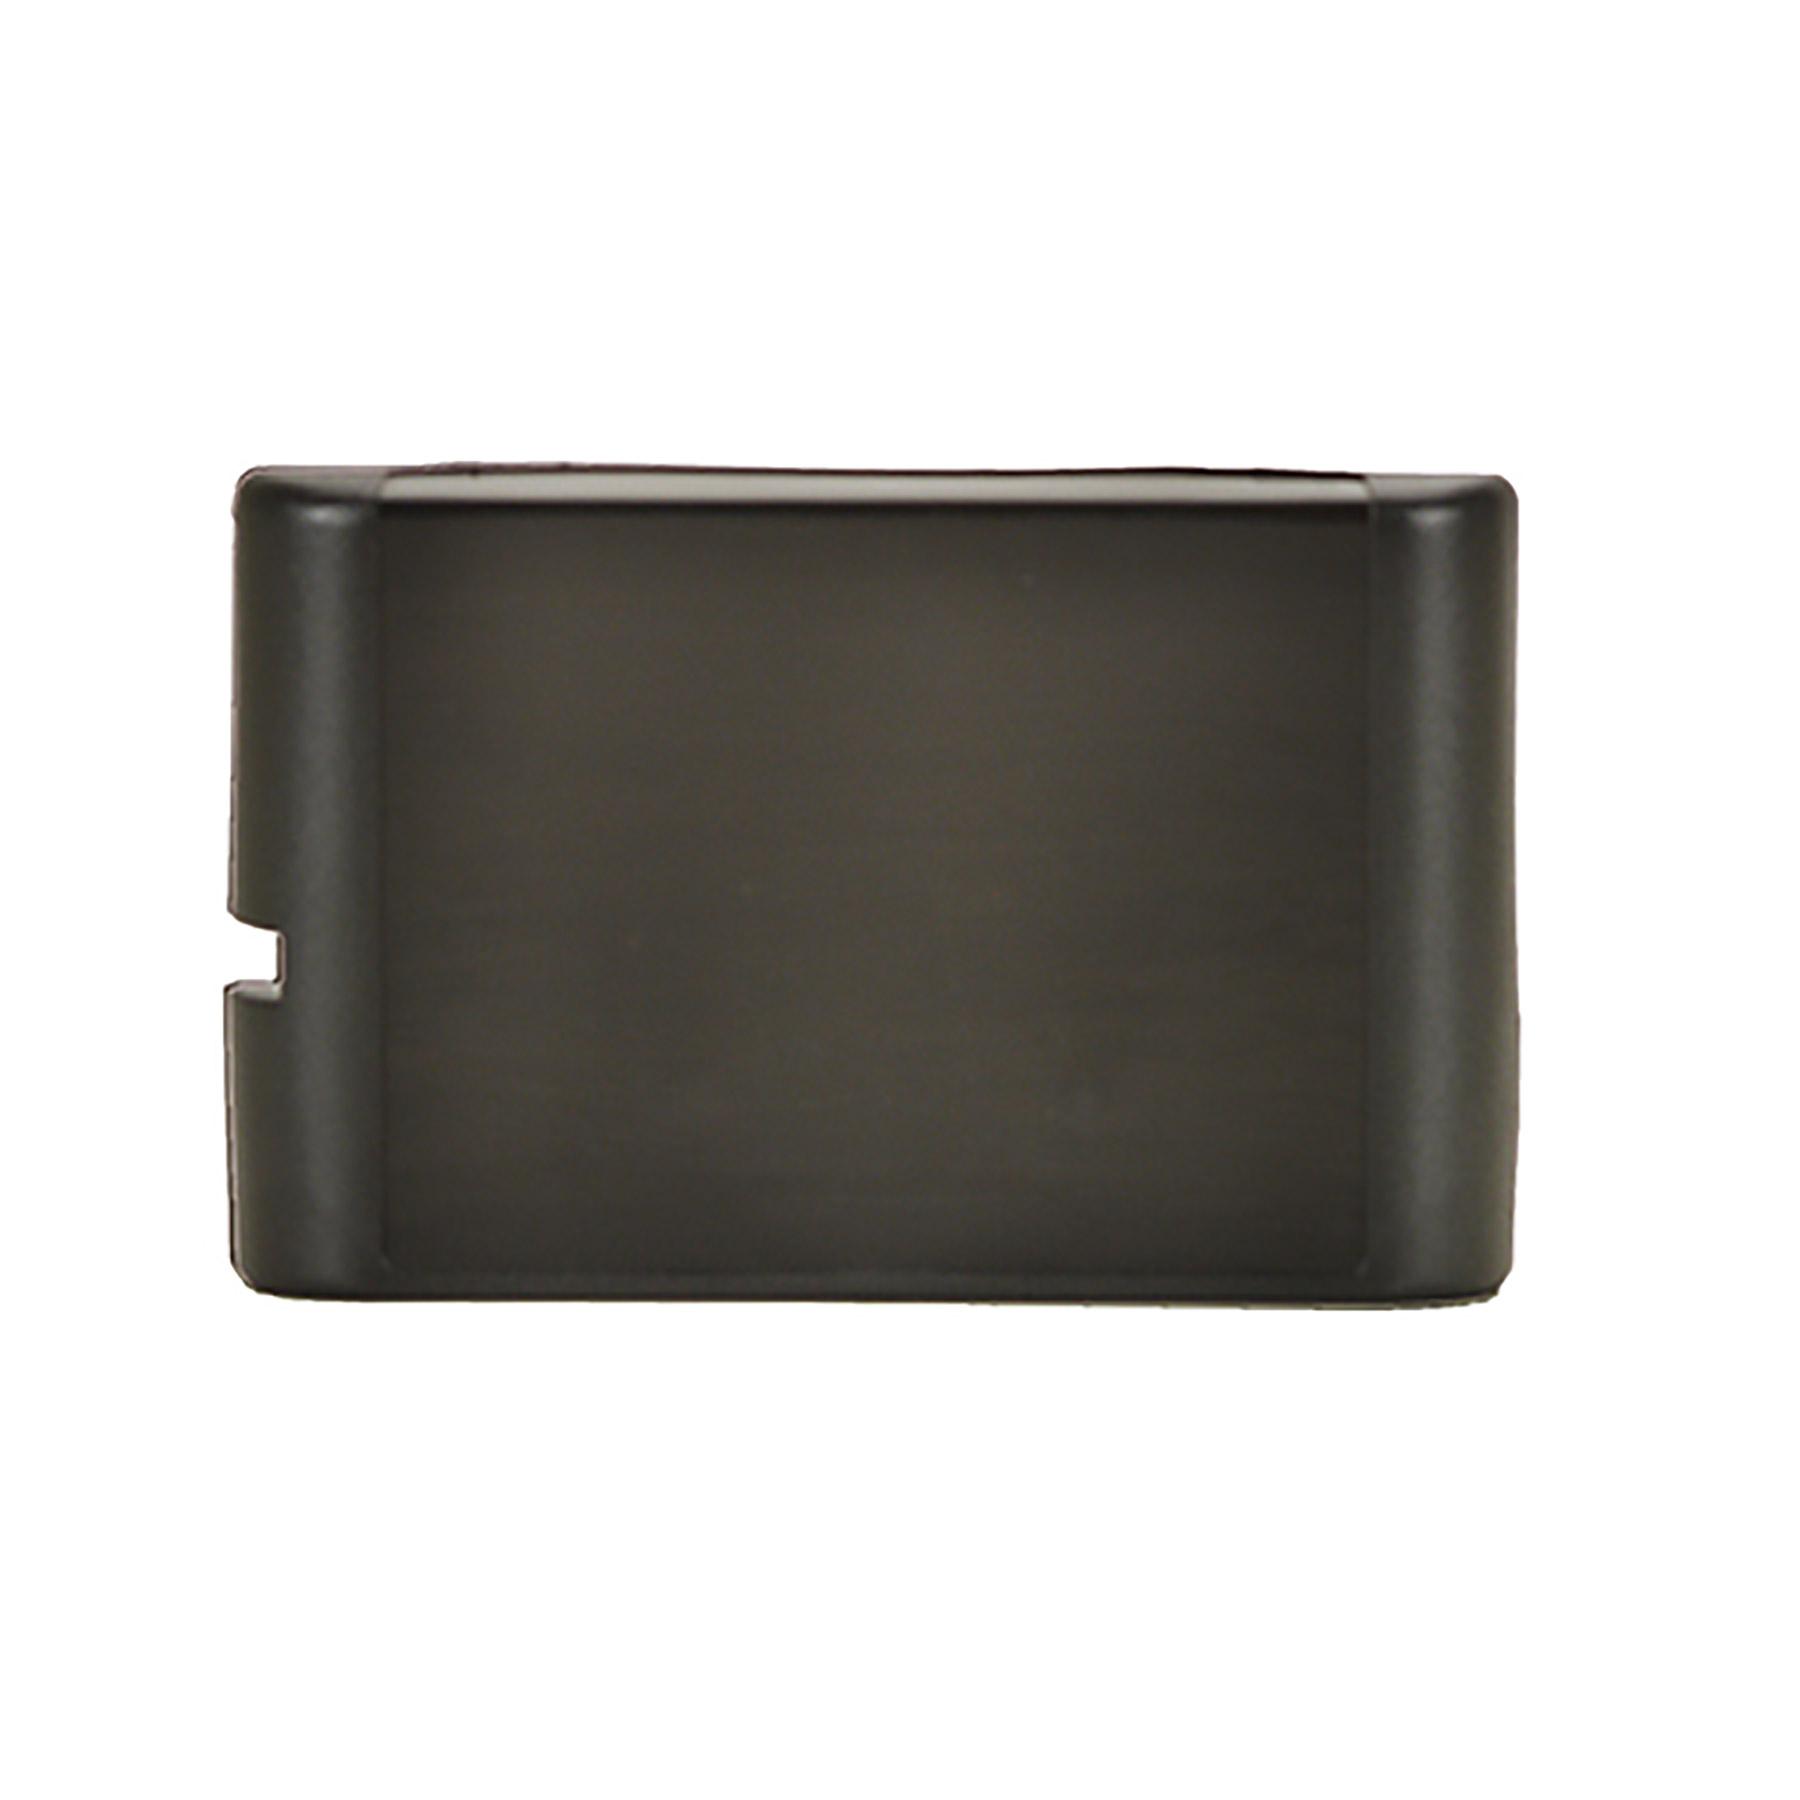 Sega Genesis Replacement Blank Cartridge Case Black New Snap O